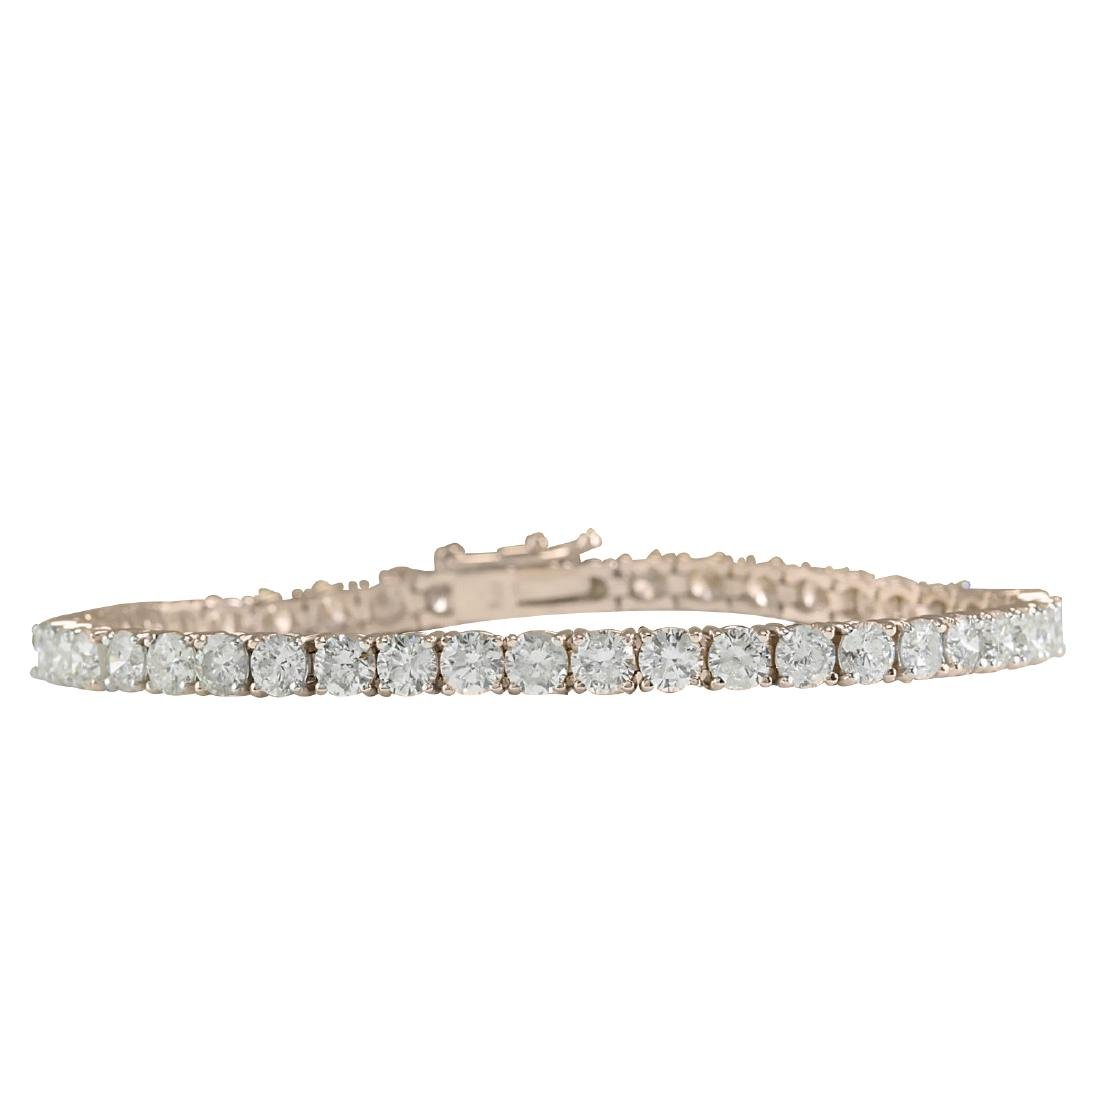 4.55CTW Natural Diamond Bracelet In 18K Rose Gold